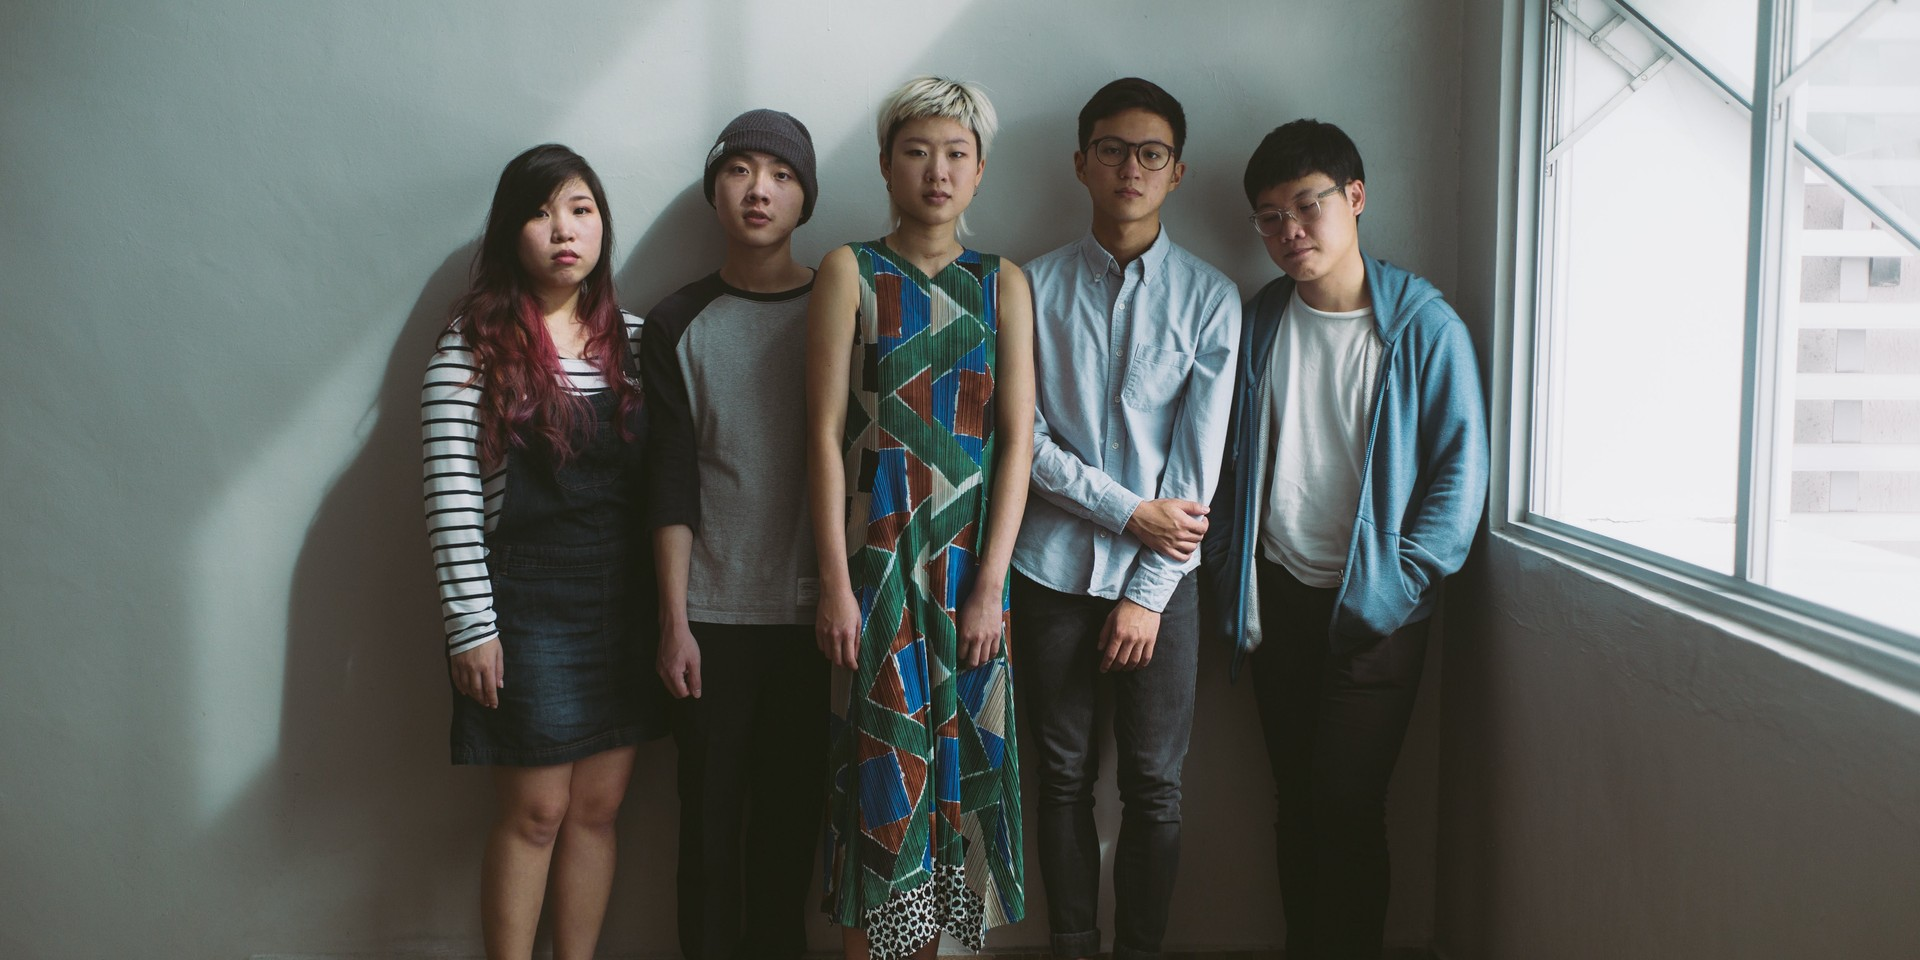 Cosmic Child announce new album Blue, release first single 'Blue/Green' – listen